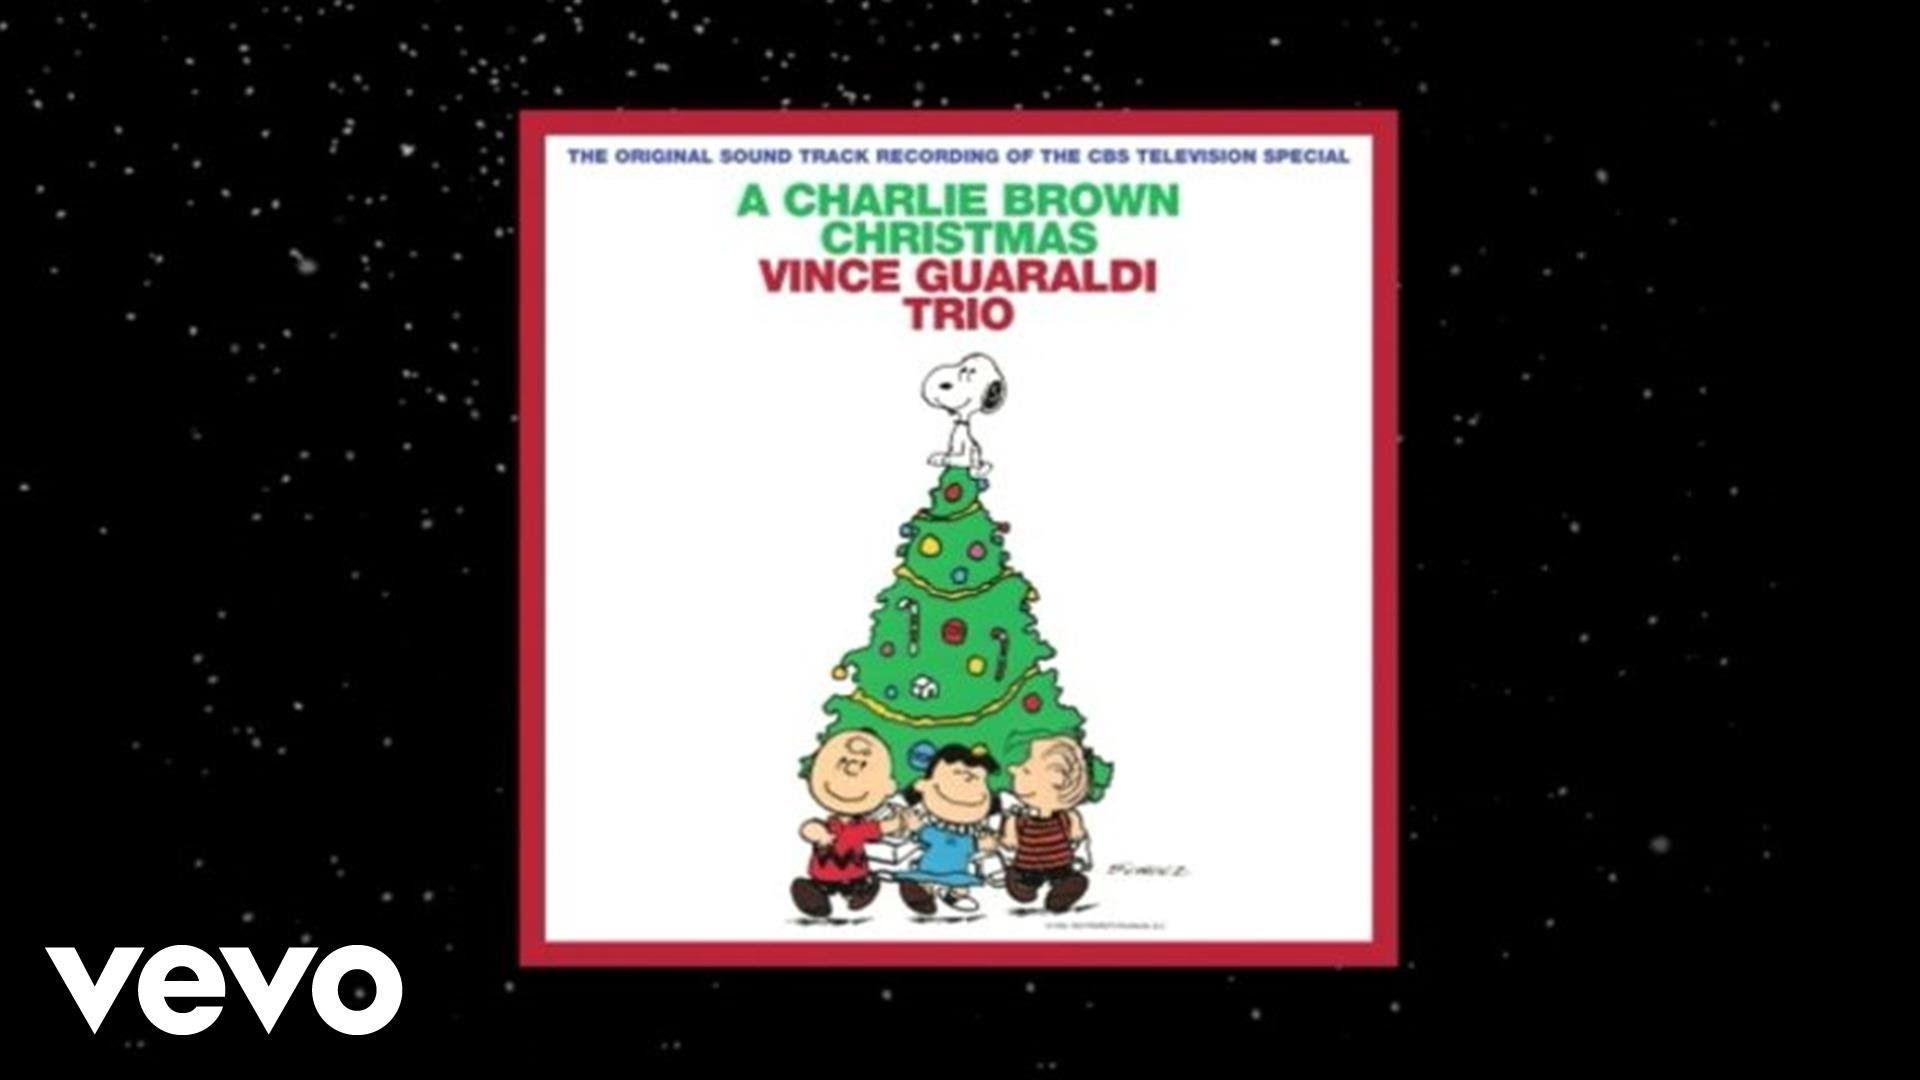 Vince Guaraldi Trio - Great Pumpkin Waltz | dance steps | Pinterest ...